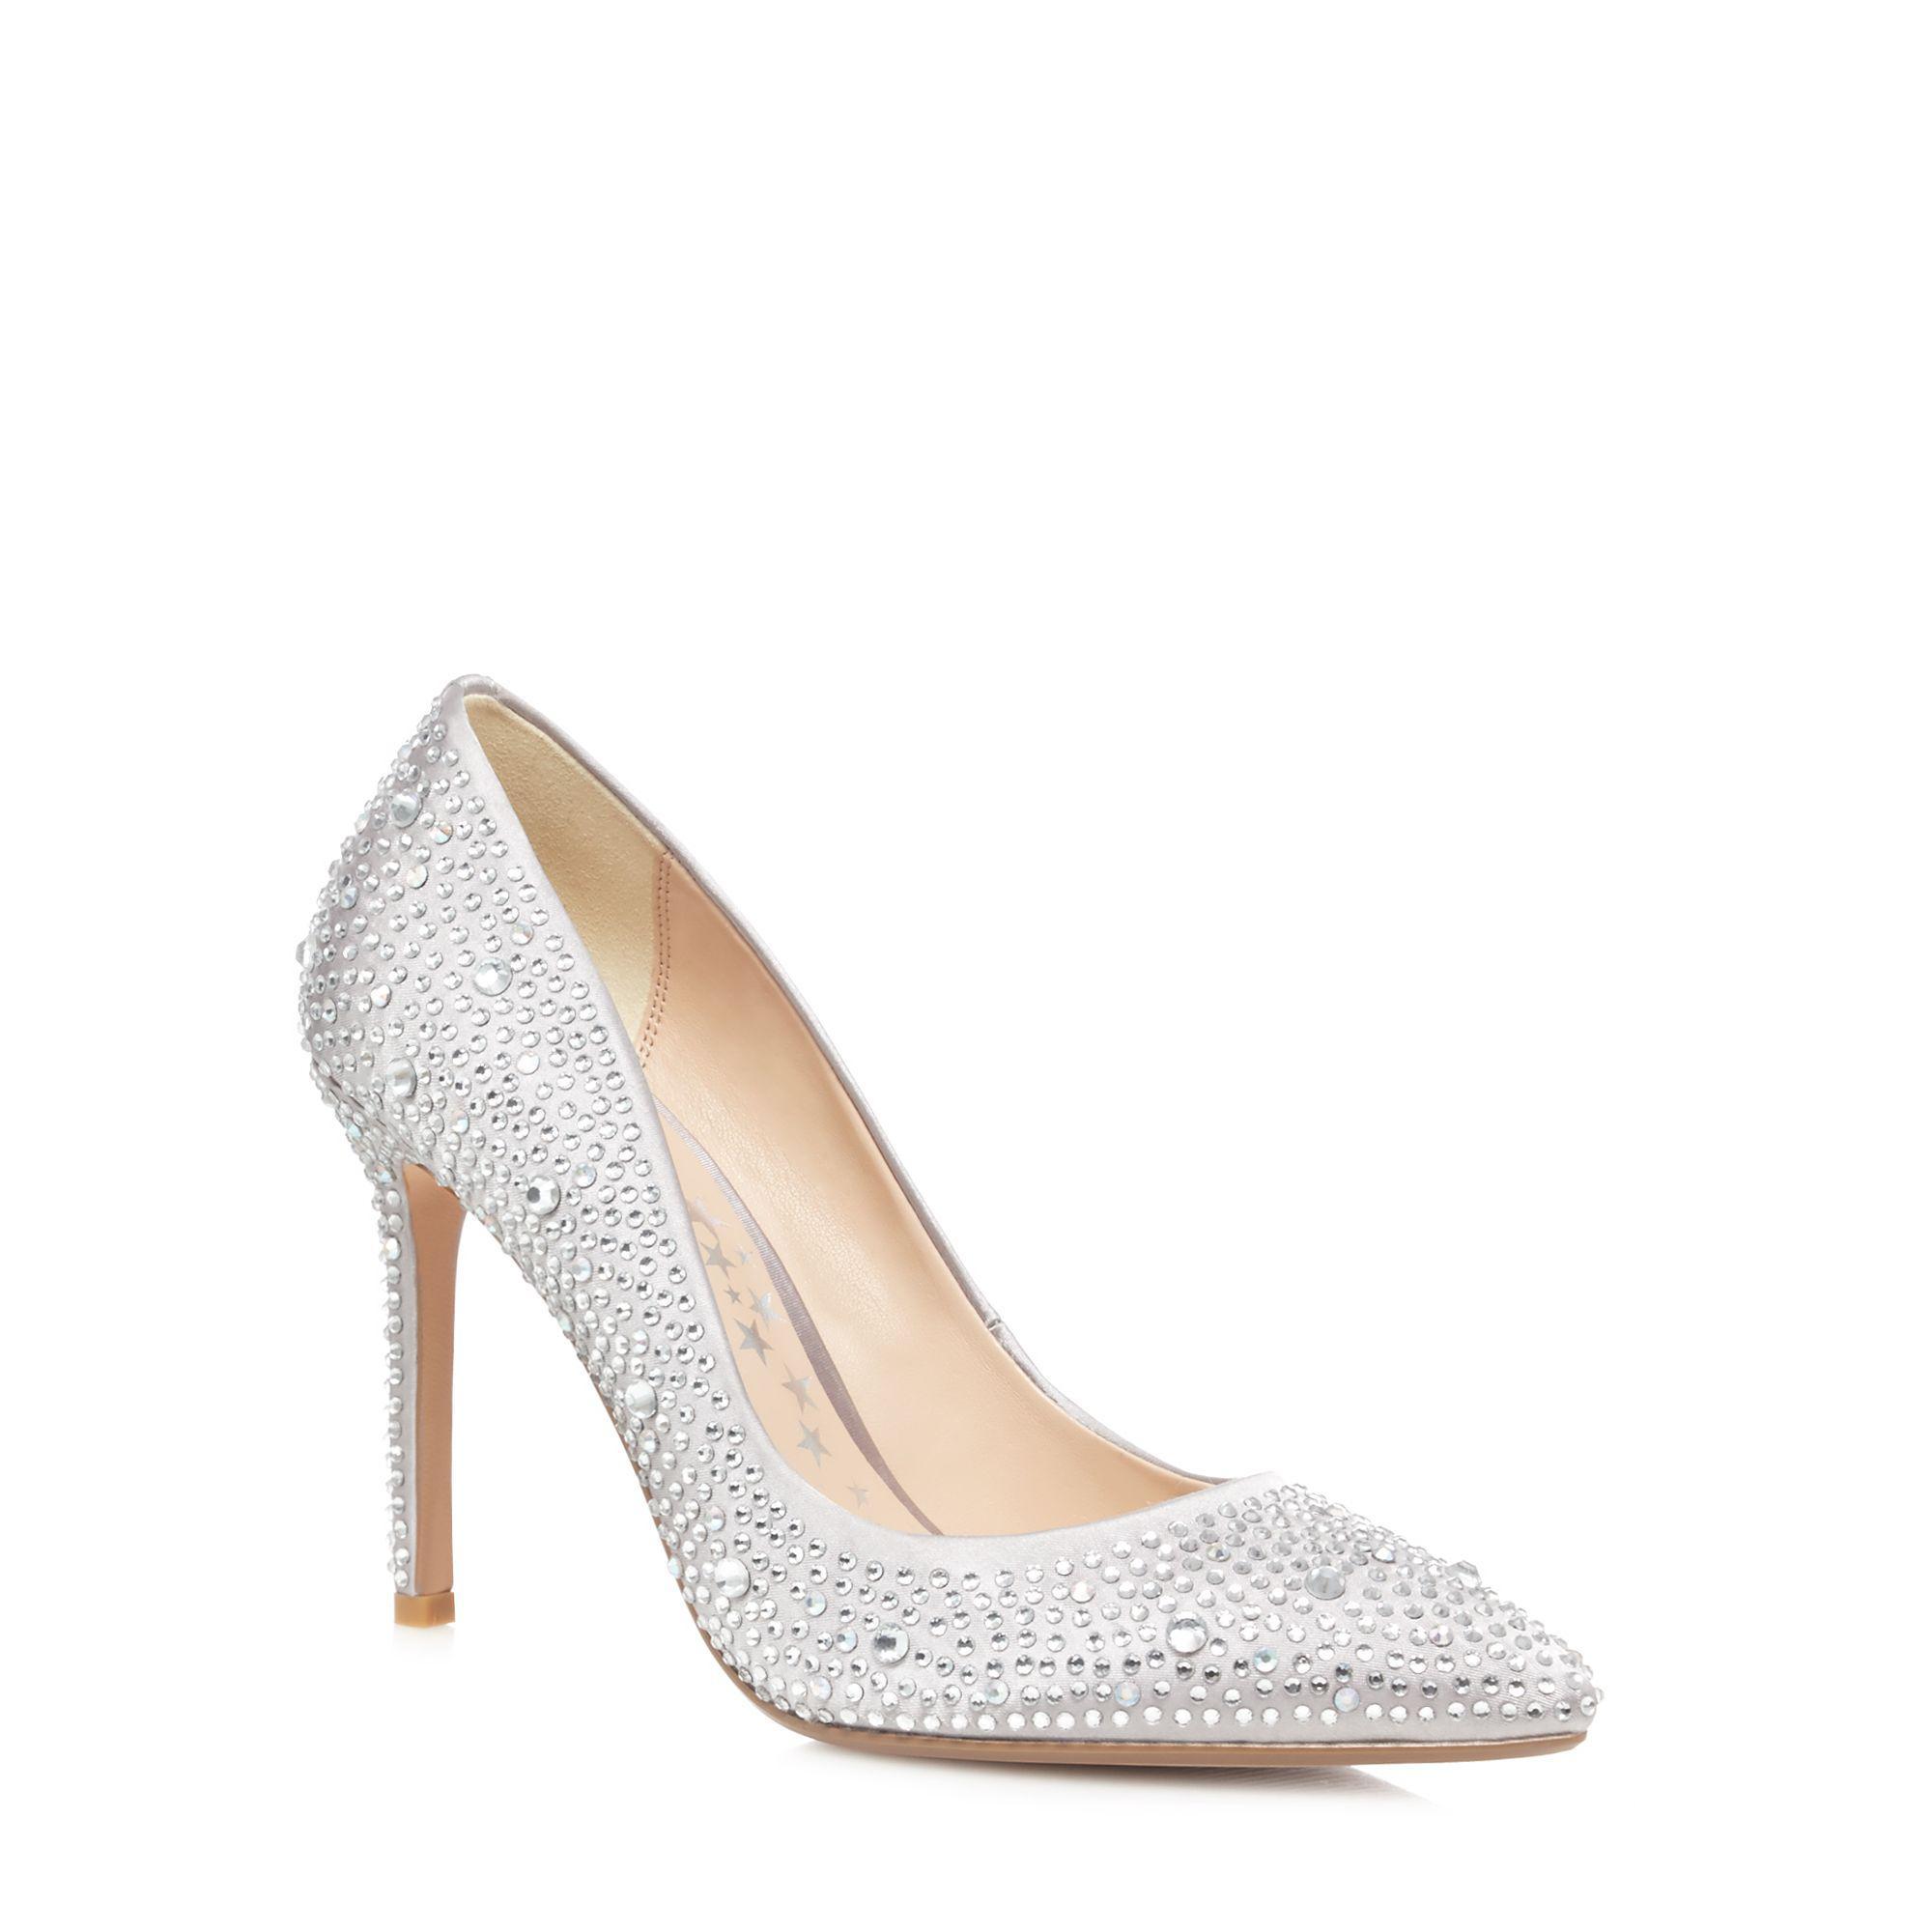 Silver satin diamante stiletto heel court shoes footlocker pictures sale online sale new styles wide range of online TylCI6CDk